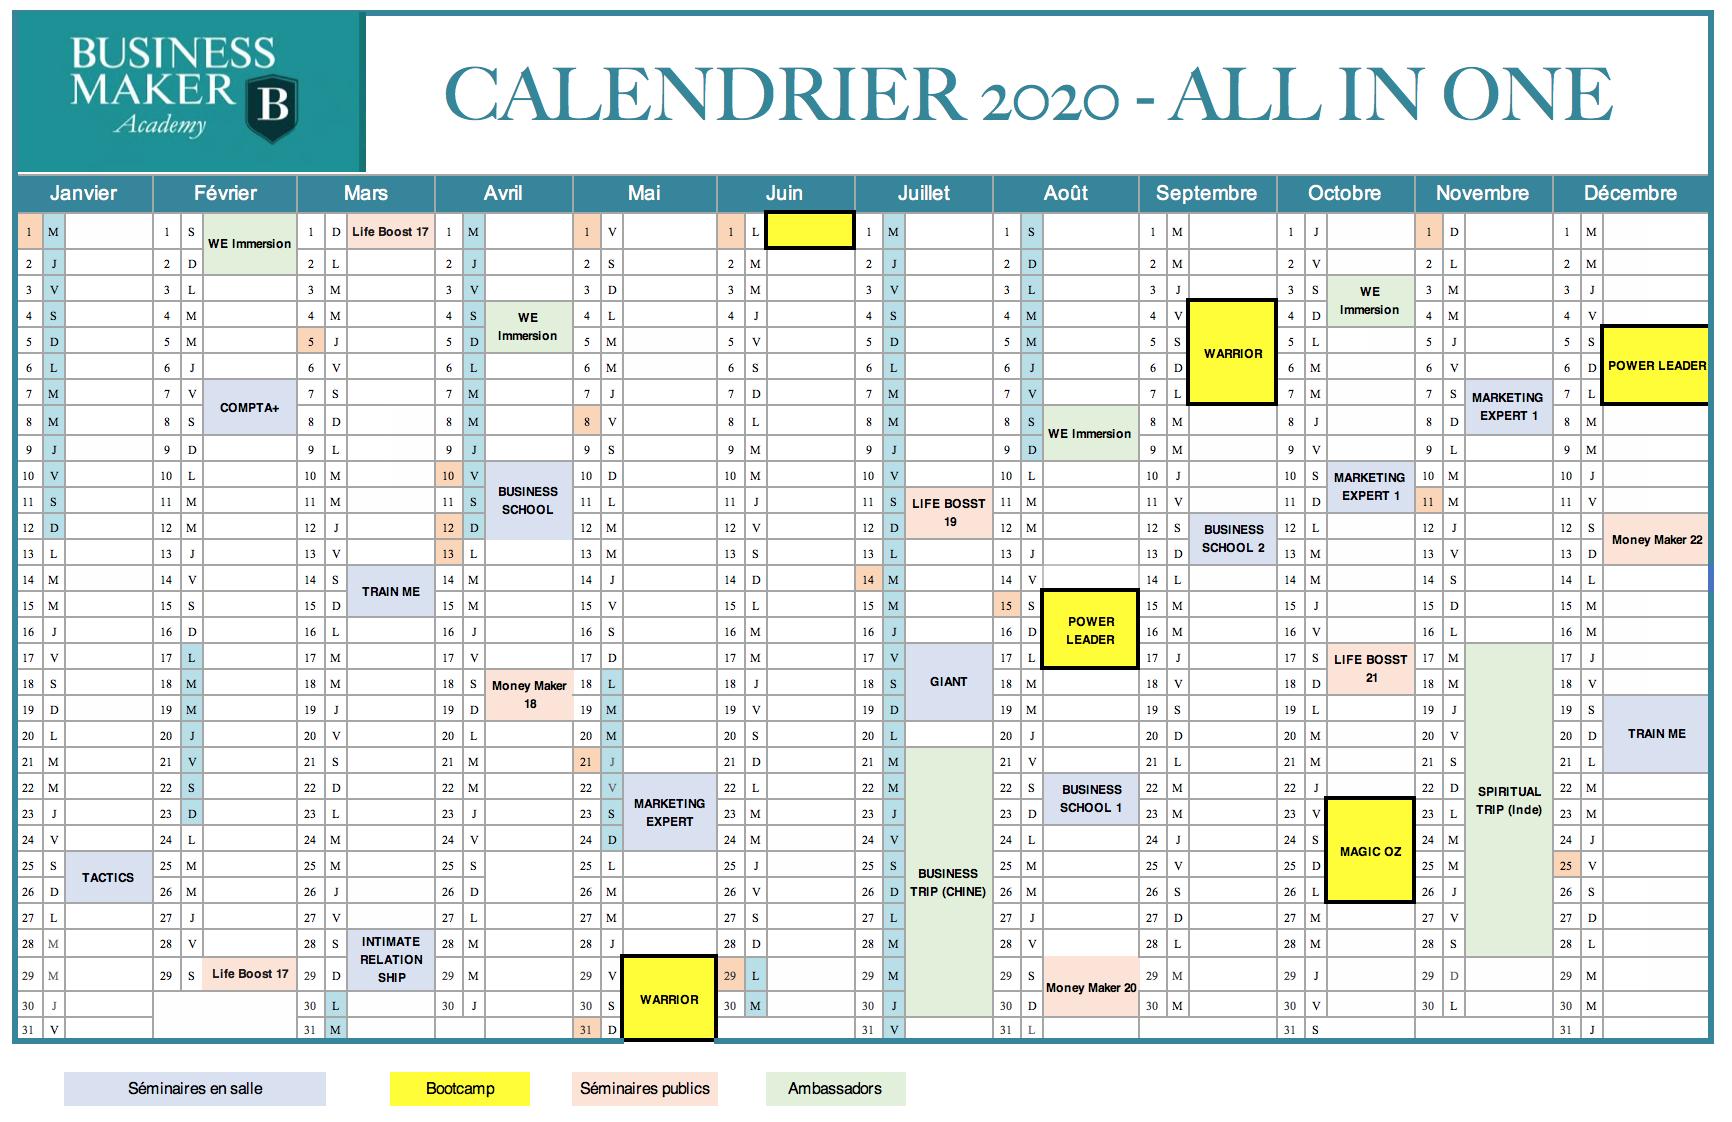 Calendrier 2020 Business Maker Academy